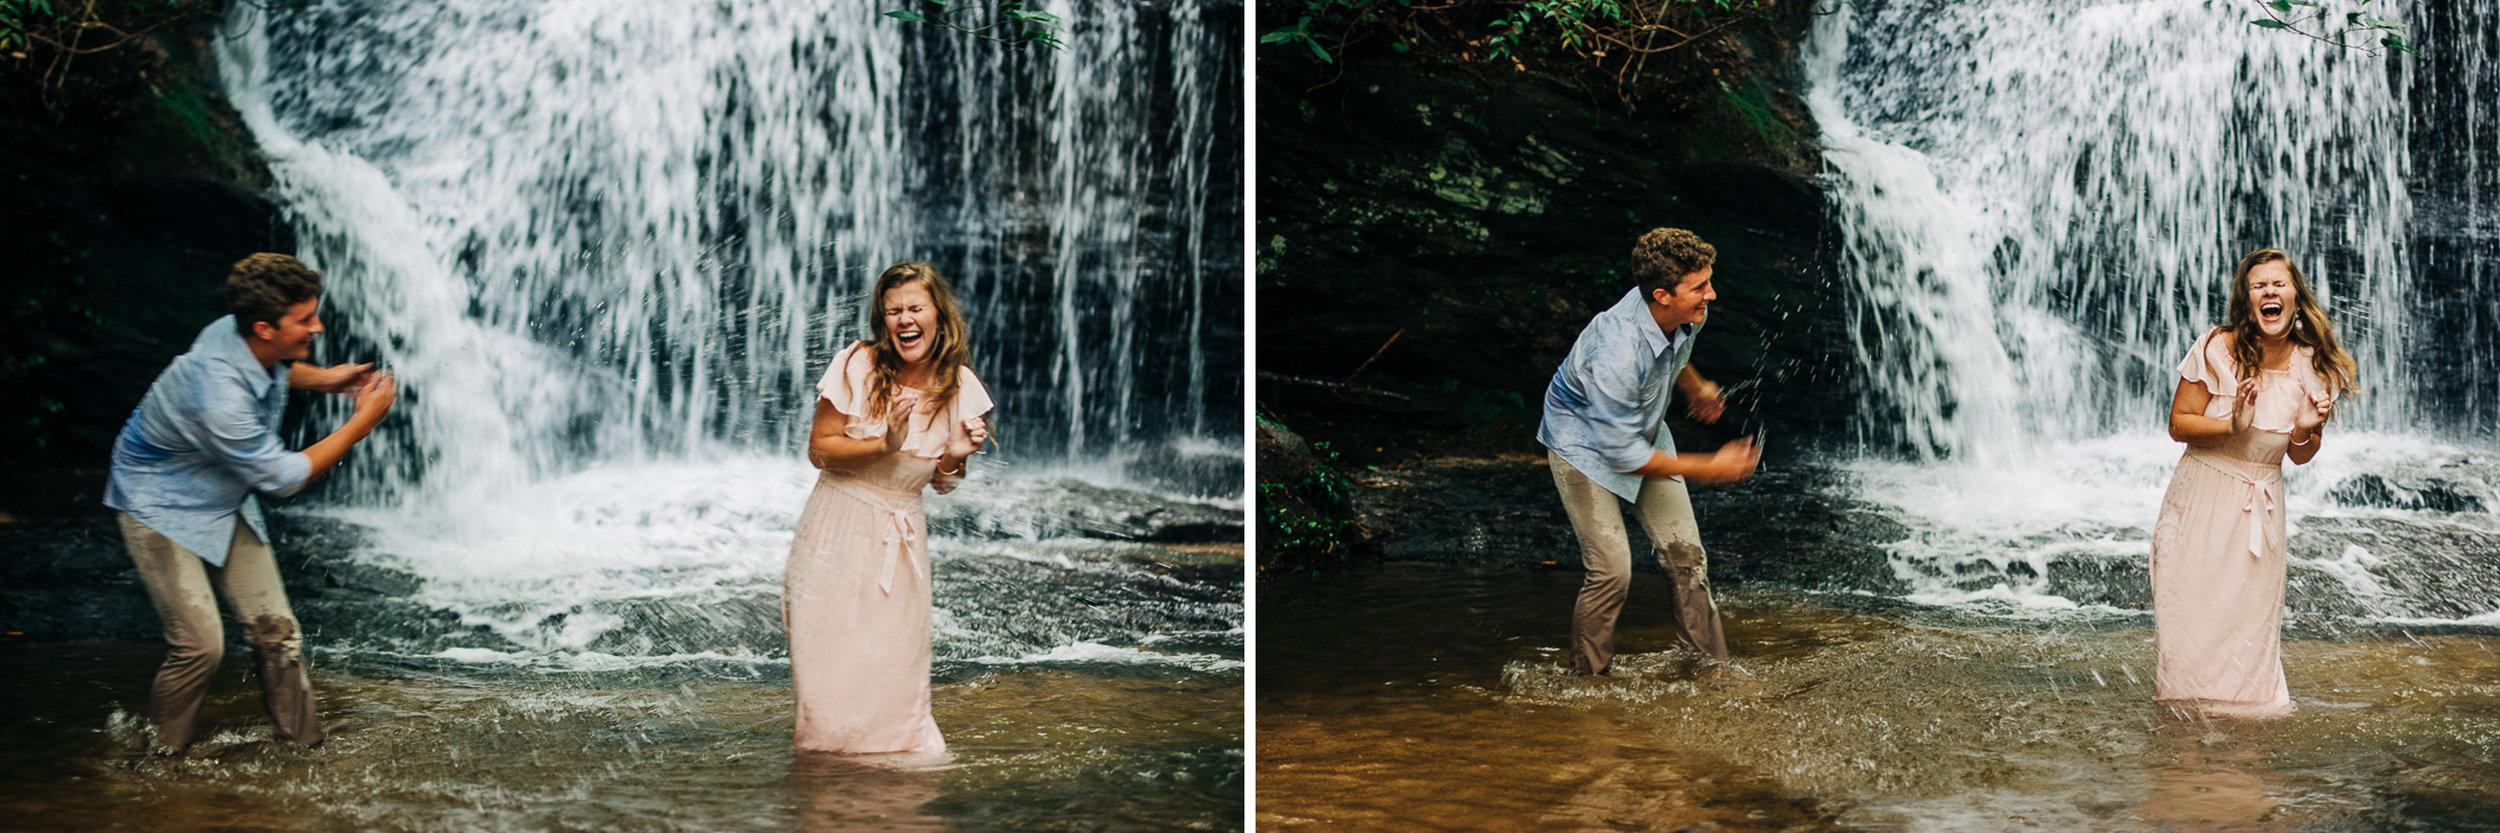 Engagement Portraits, Summer Engagement, Summer Mast Photography, 25.jpg